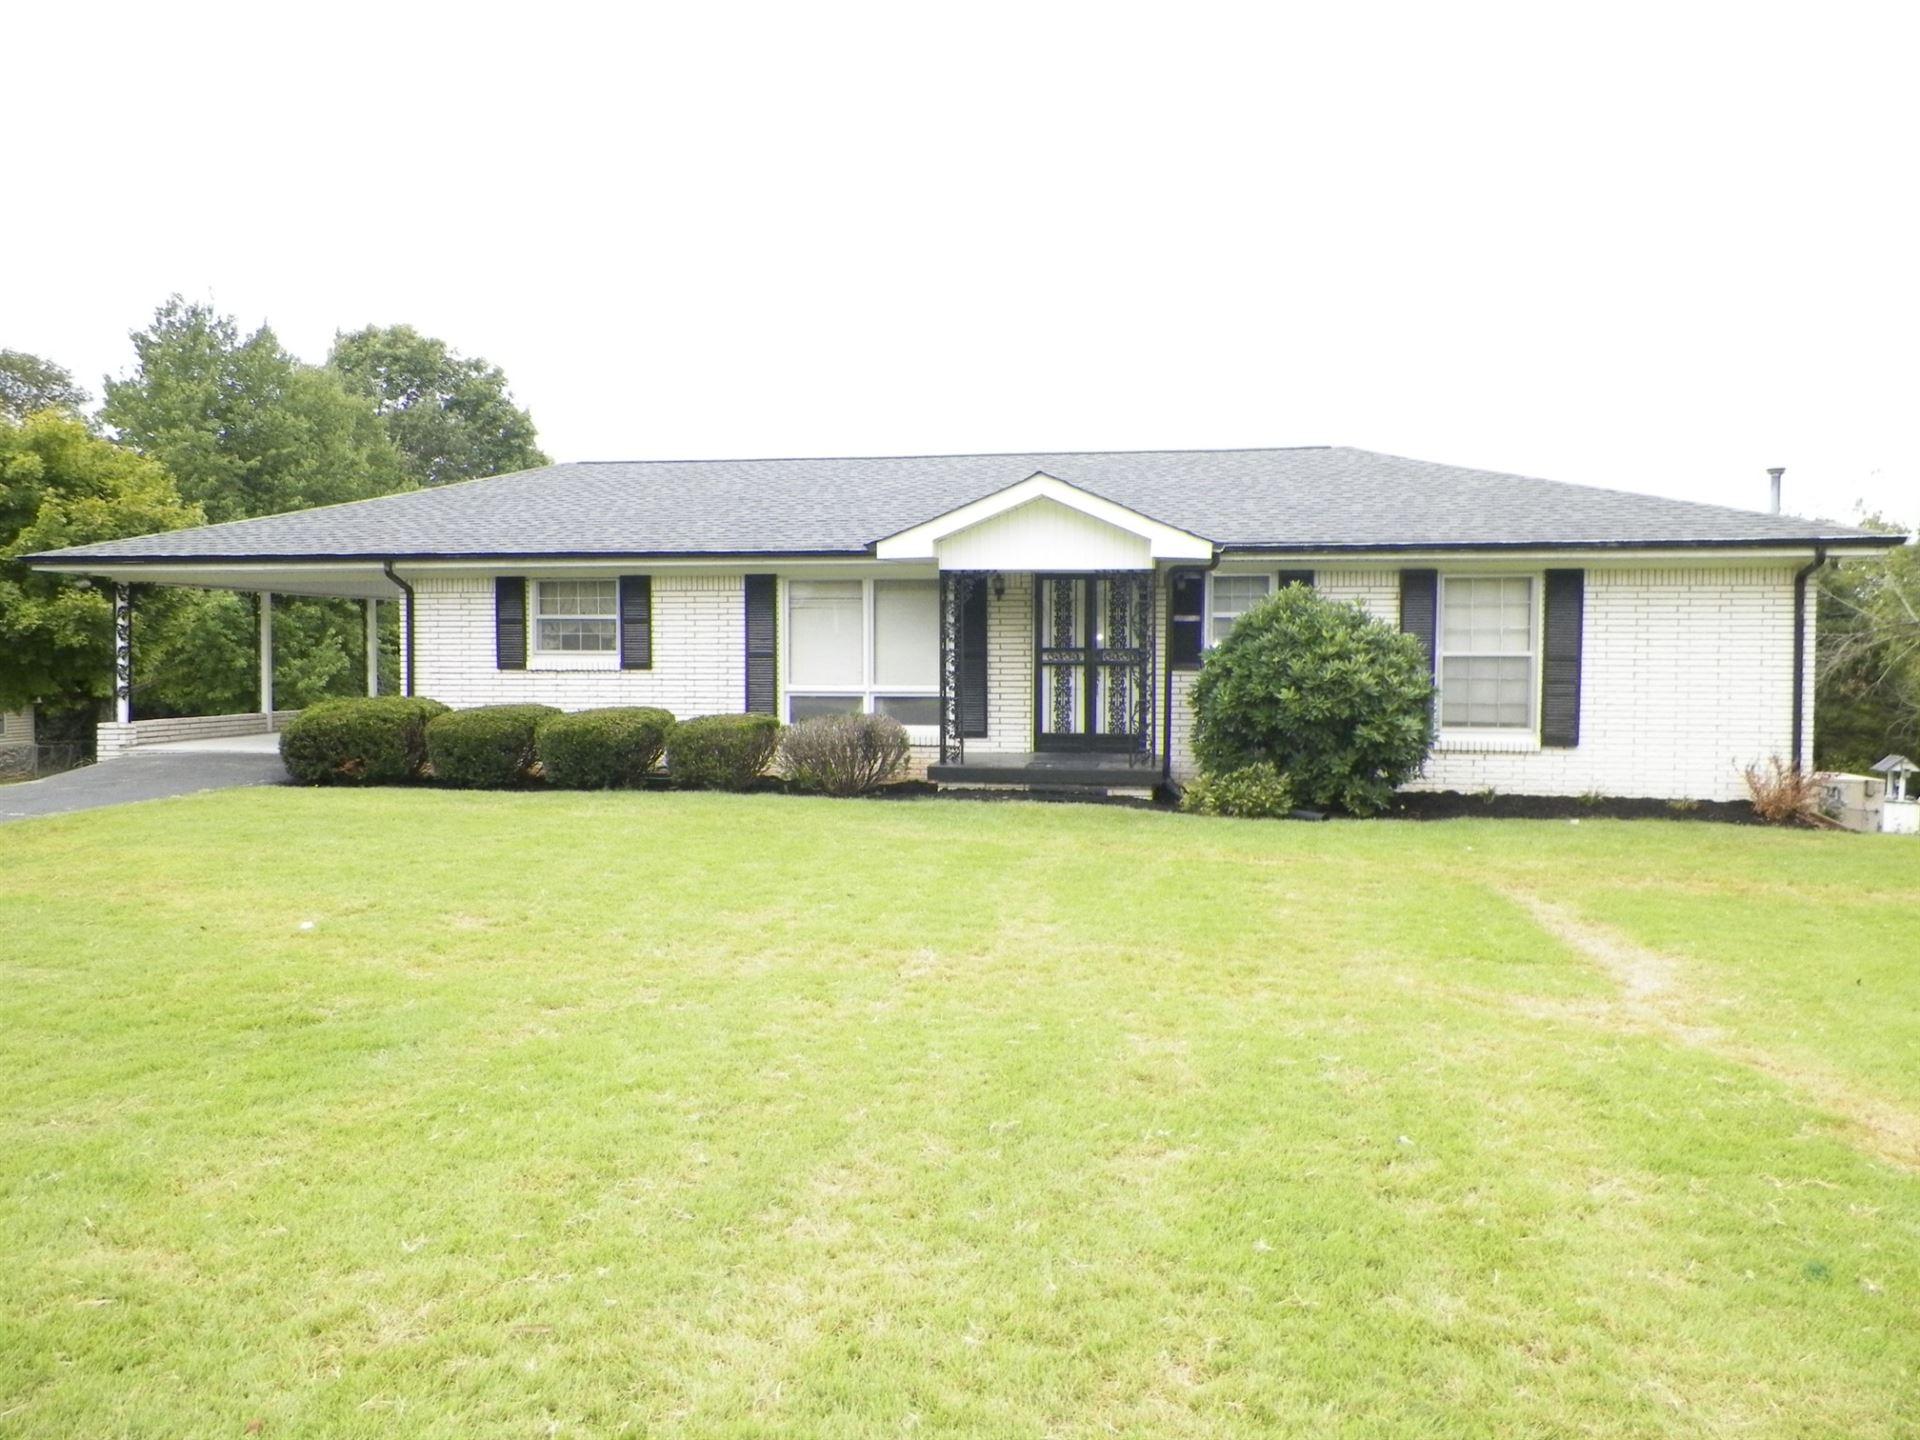 158 Circle Dr, Hartsville, TN 37074 - MLS#: 2292212